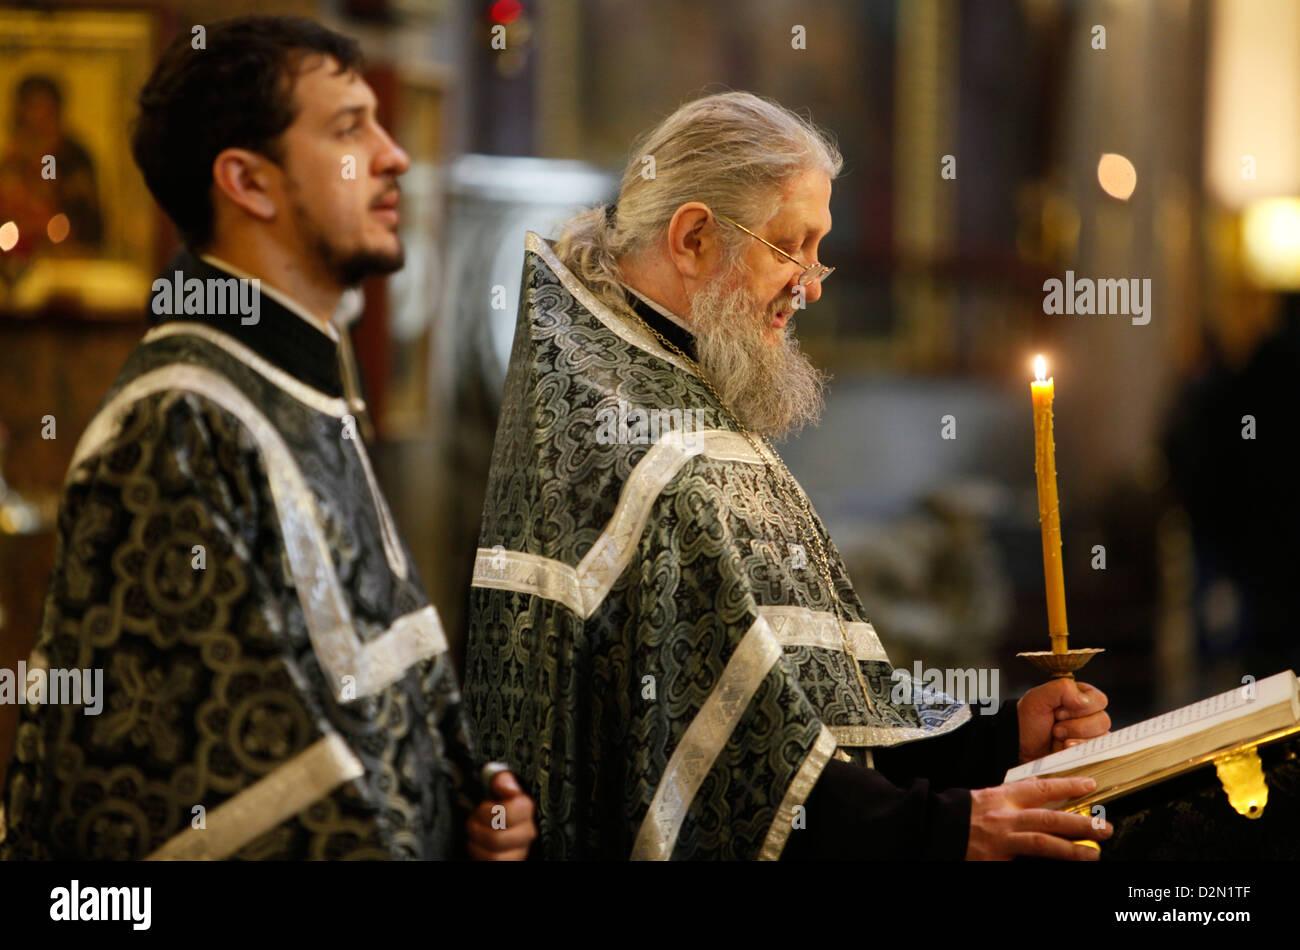 Russian Orthodox Mass, Kazan cathedral, St. Petersburg, Russia, Europe - Stock Image